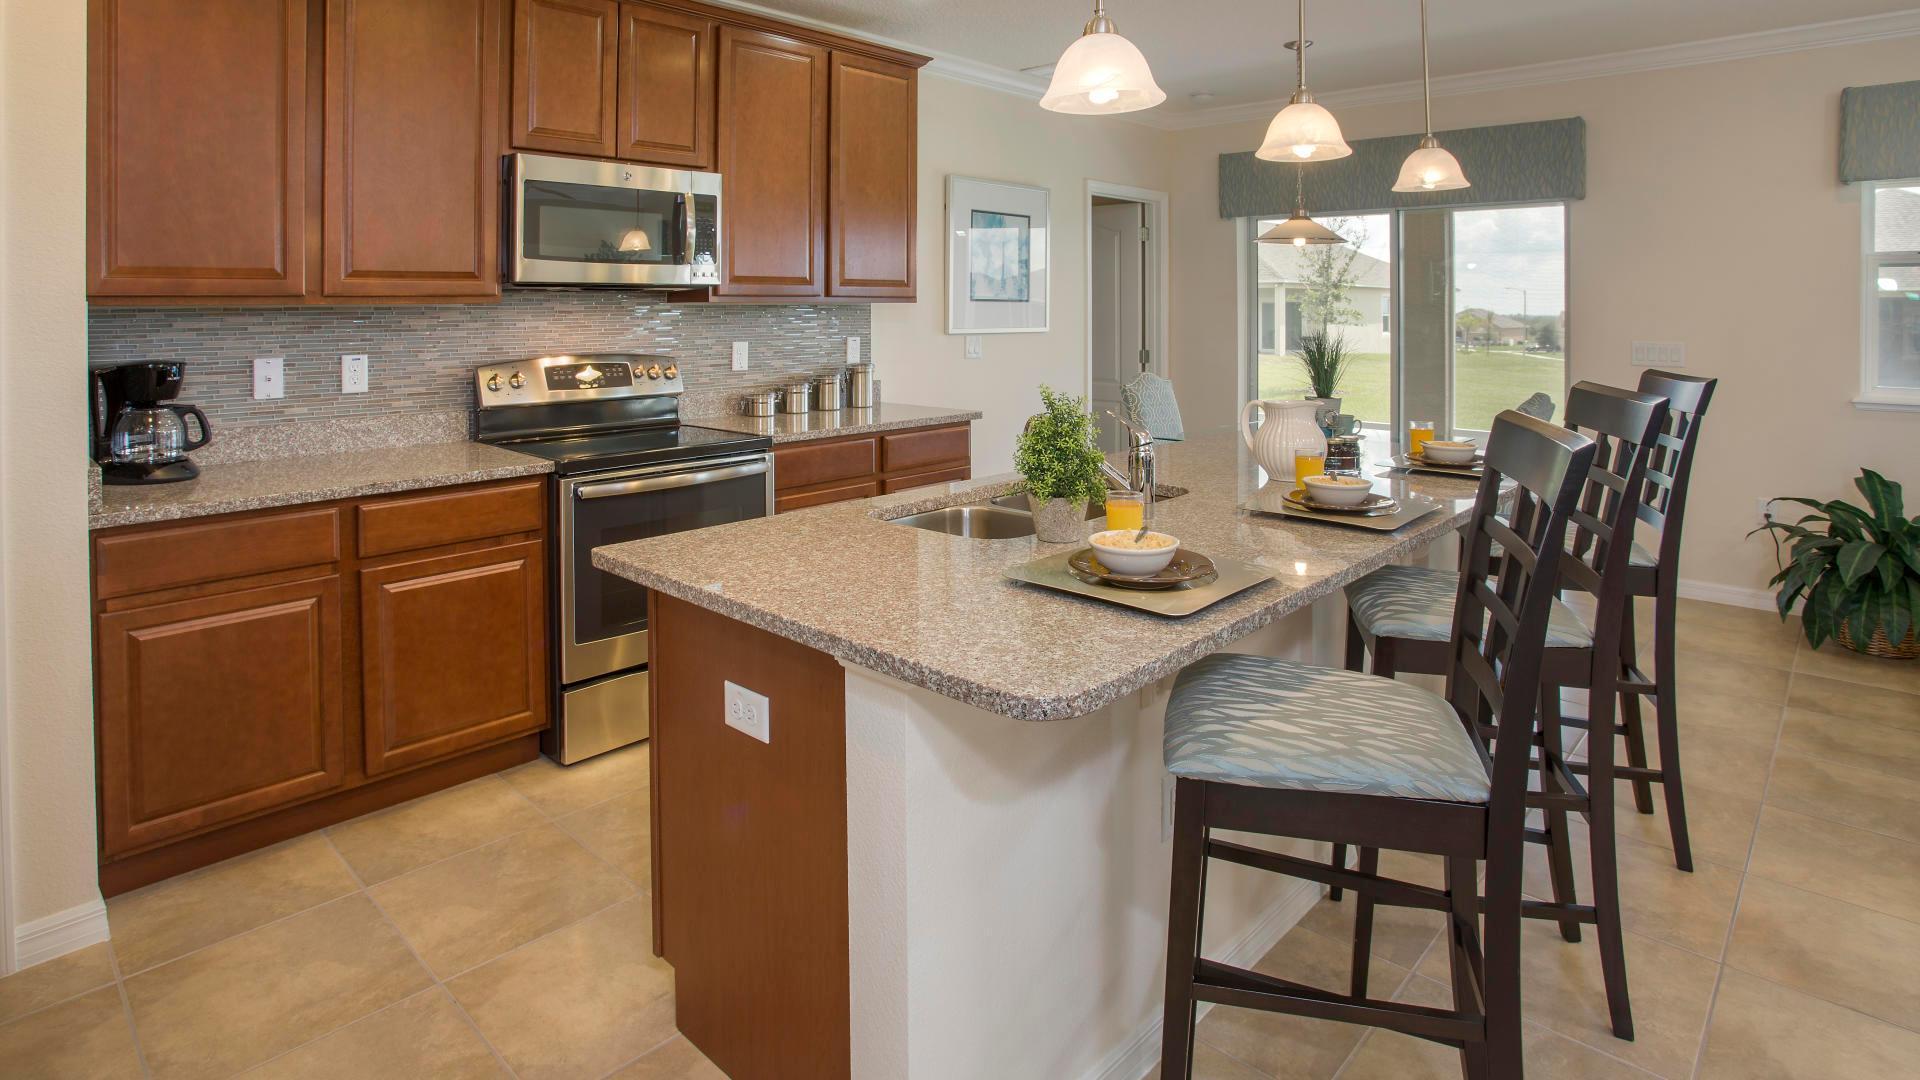 Kitchen featured in the Fairfield By Maronda Homes in Daytona Beach, FL